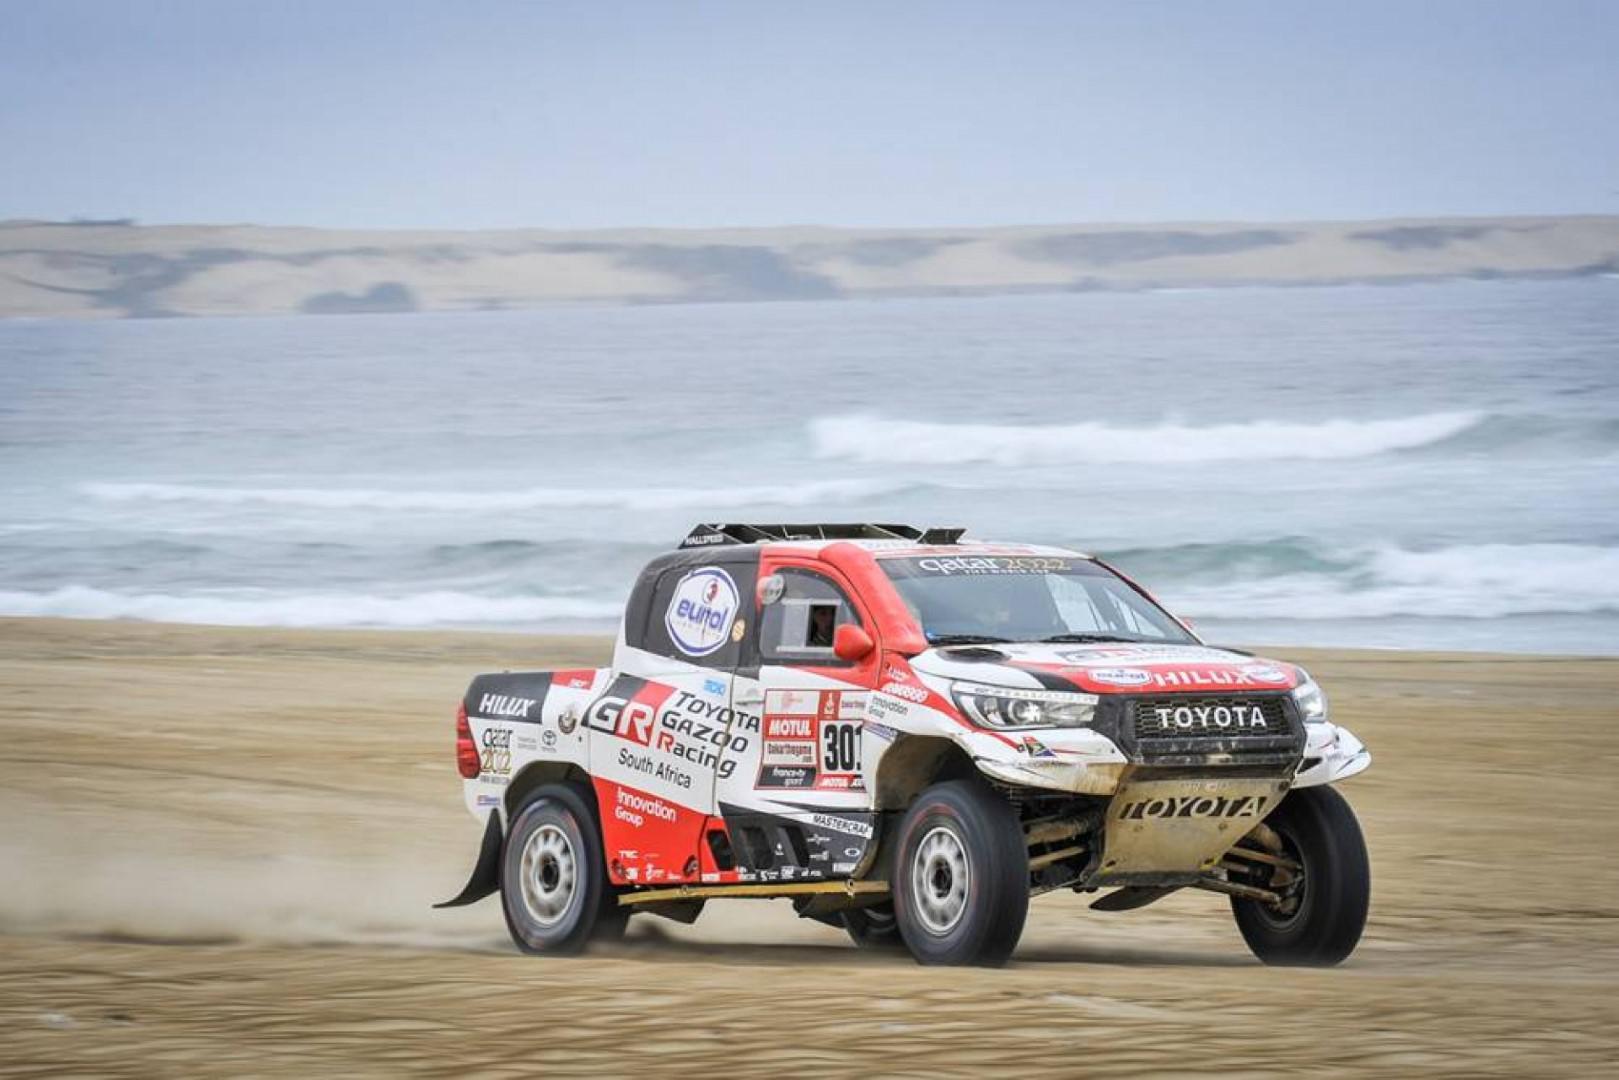 Dakar 2019 : Loeb vainqueur du jour, Al Attiyah solide leader